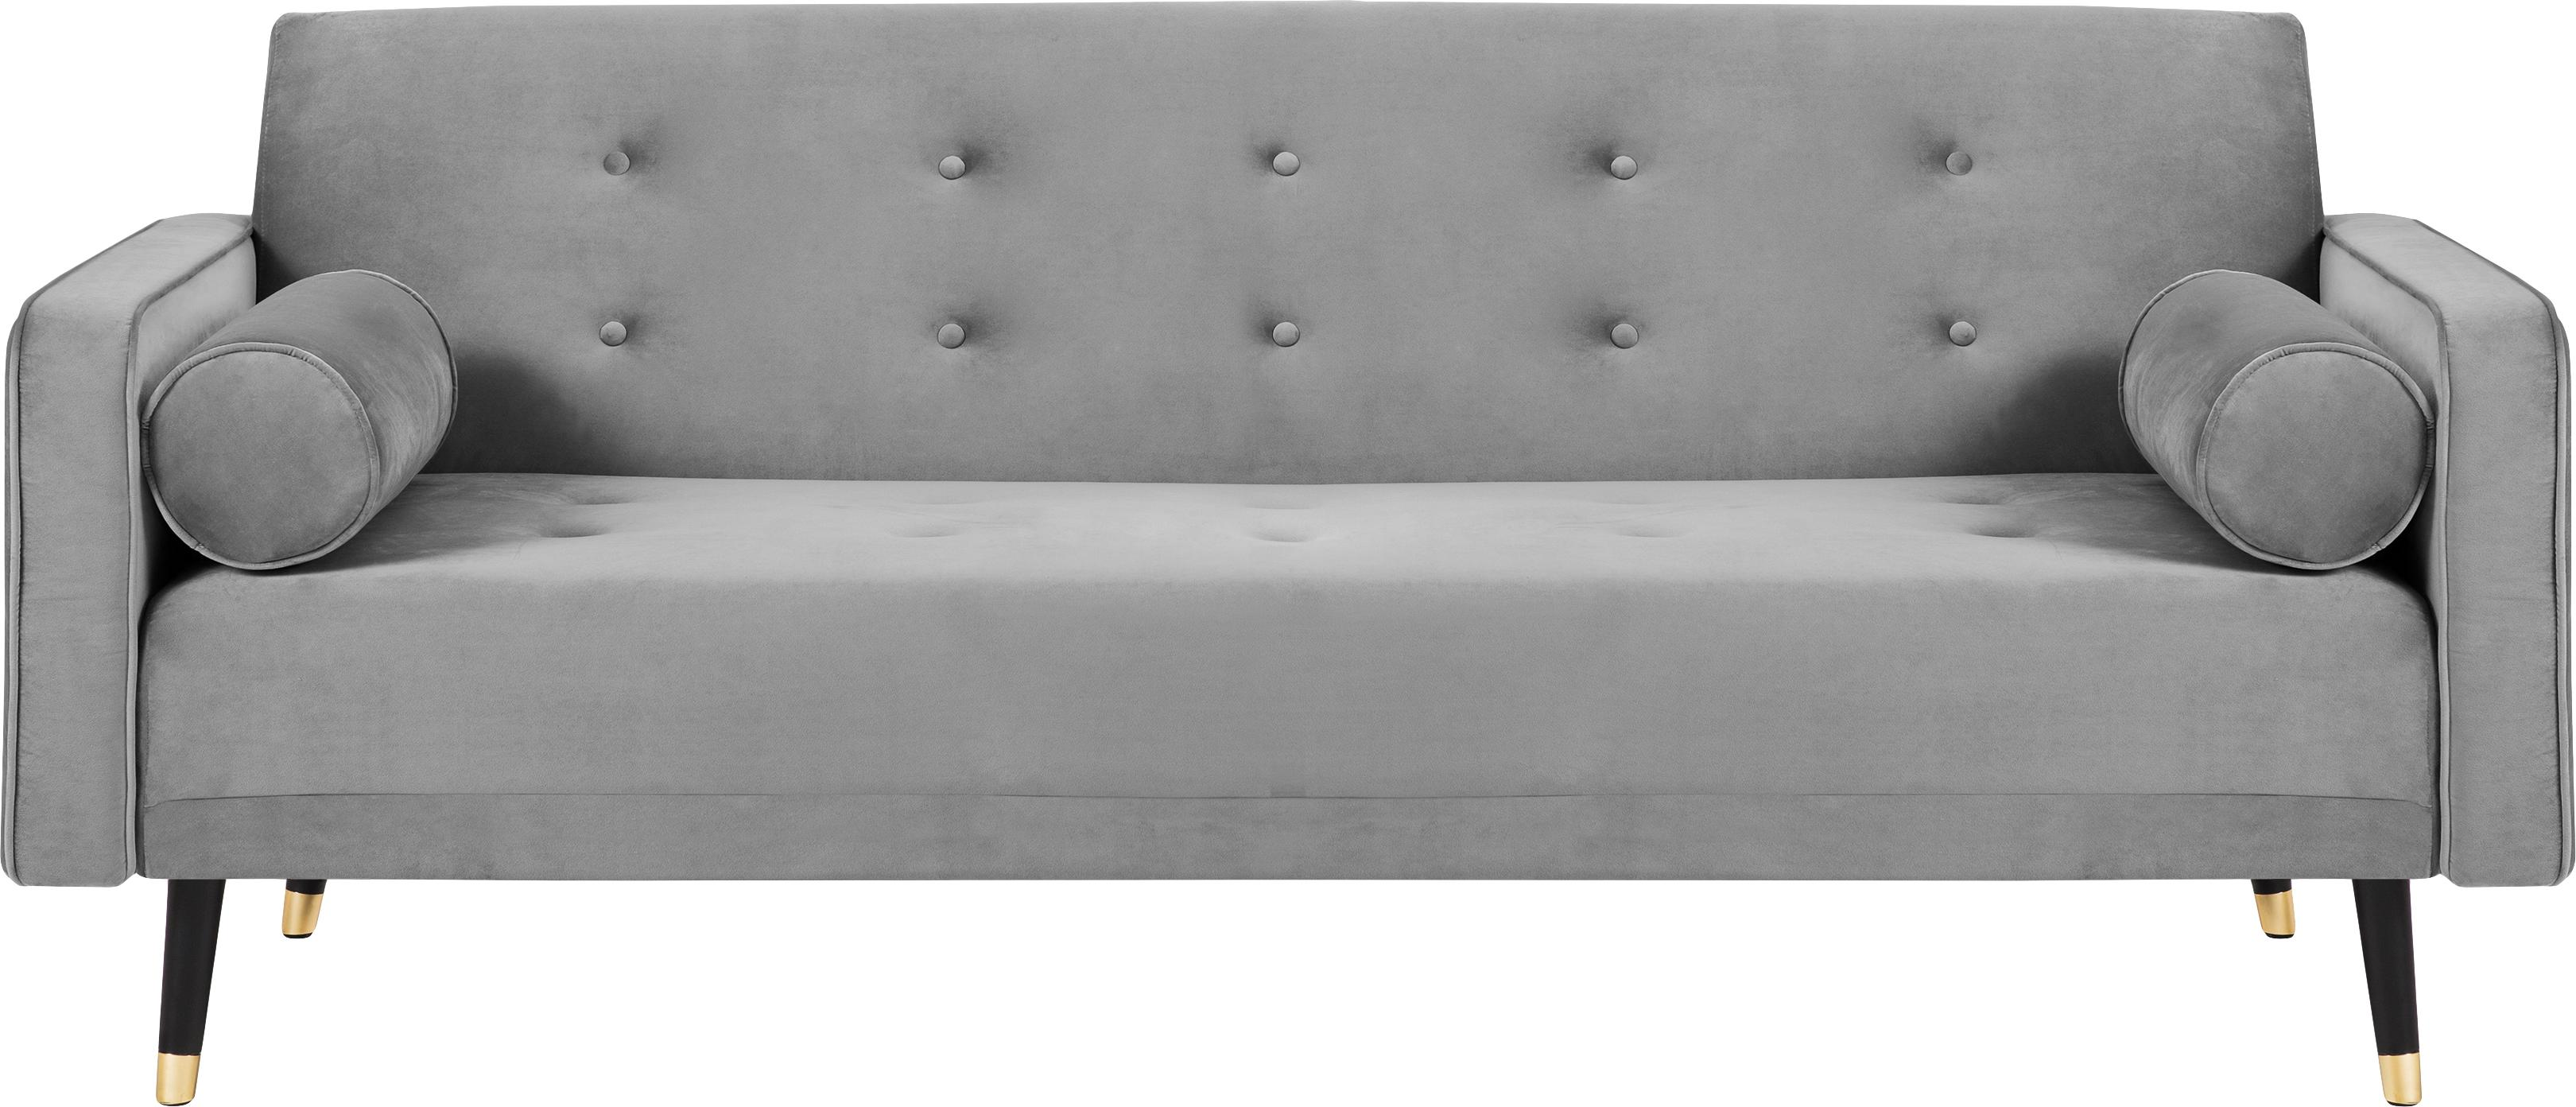 Samt-Schlafsofa Gia (3-Sitzer), Bezug: Polyestersamt Der strapaz, Rahmen: Massives Kiefernholz, Korpus: Spanplatte, Sperrholz, Sp, Samt Hellgrau, B 212 x T 93 cm